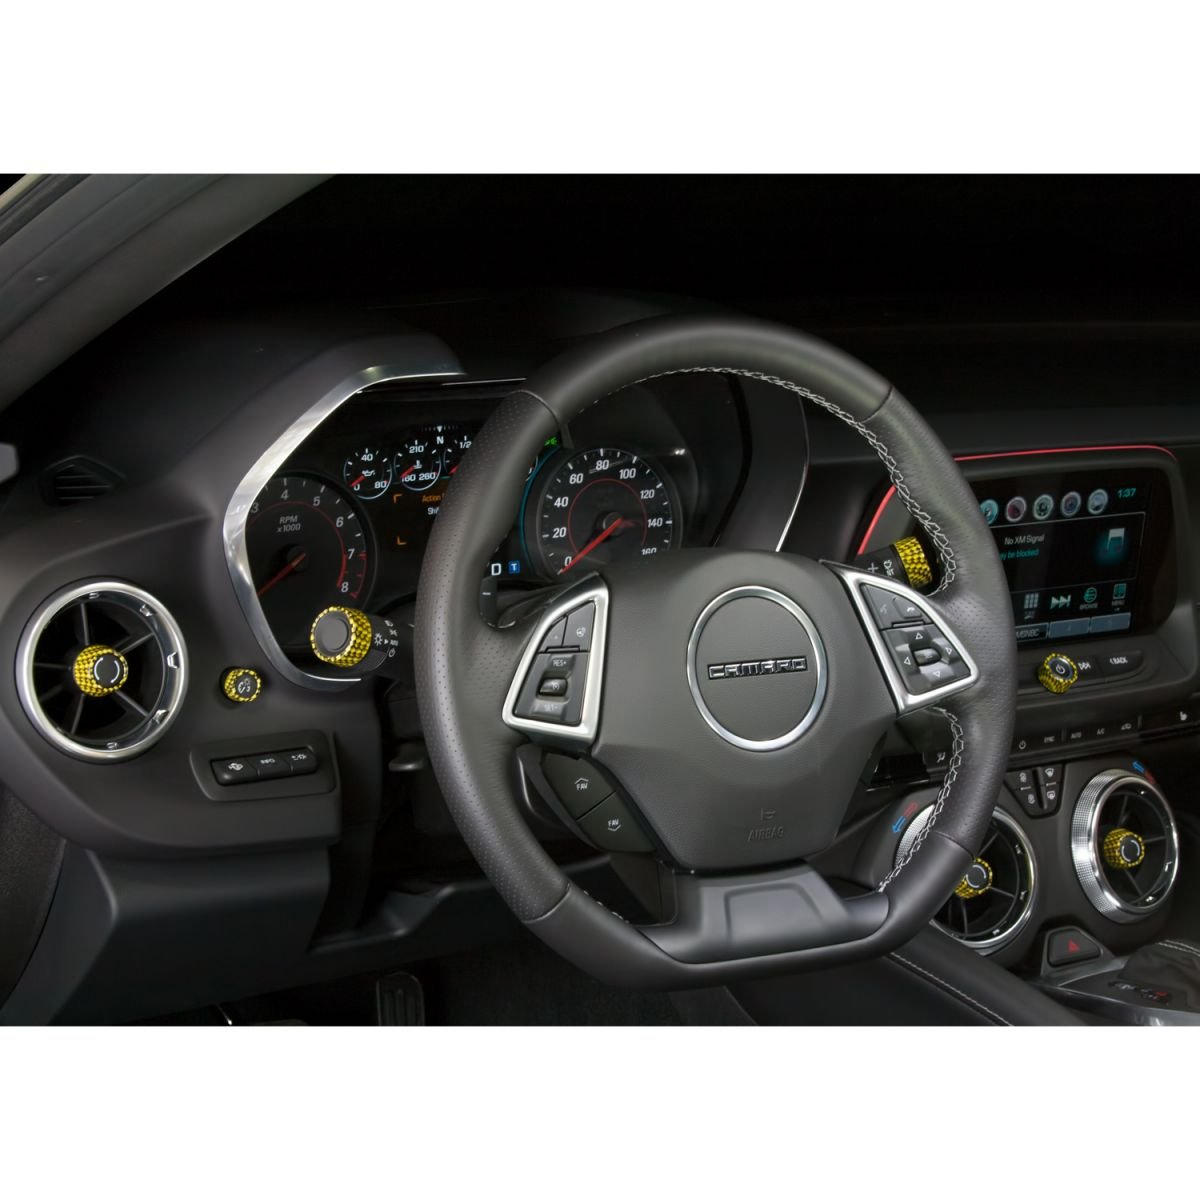 2016 Camaro 6th Generation Interior Knob Kit Color Matched Hydro Carbon Now At Rpi Camaro6